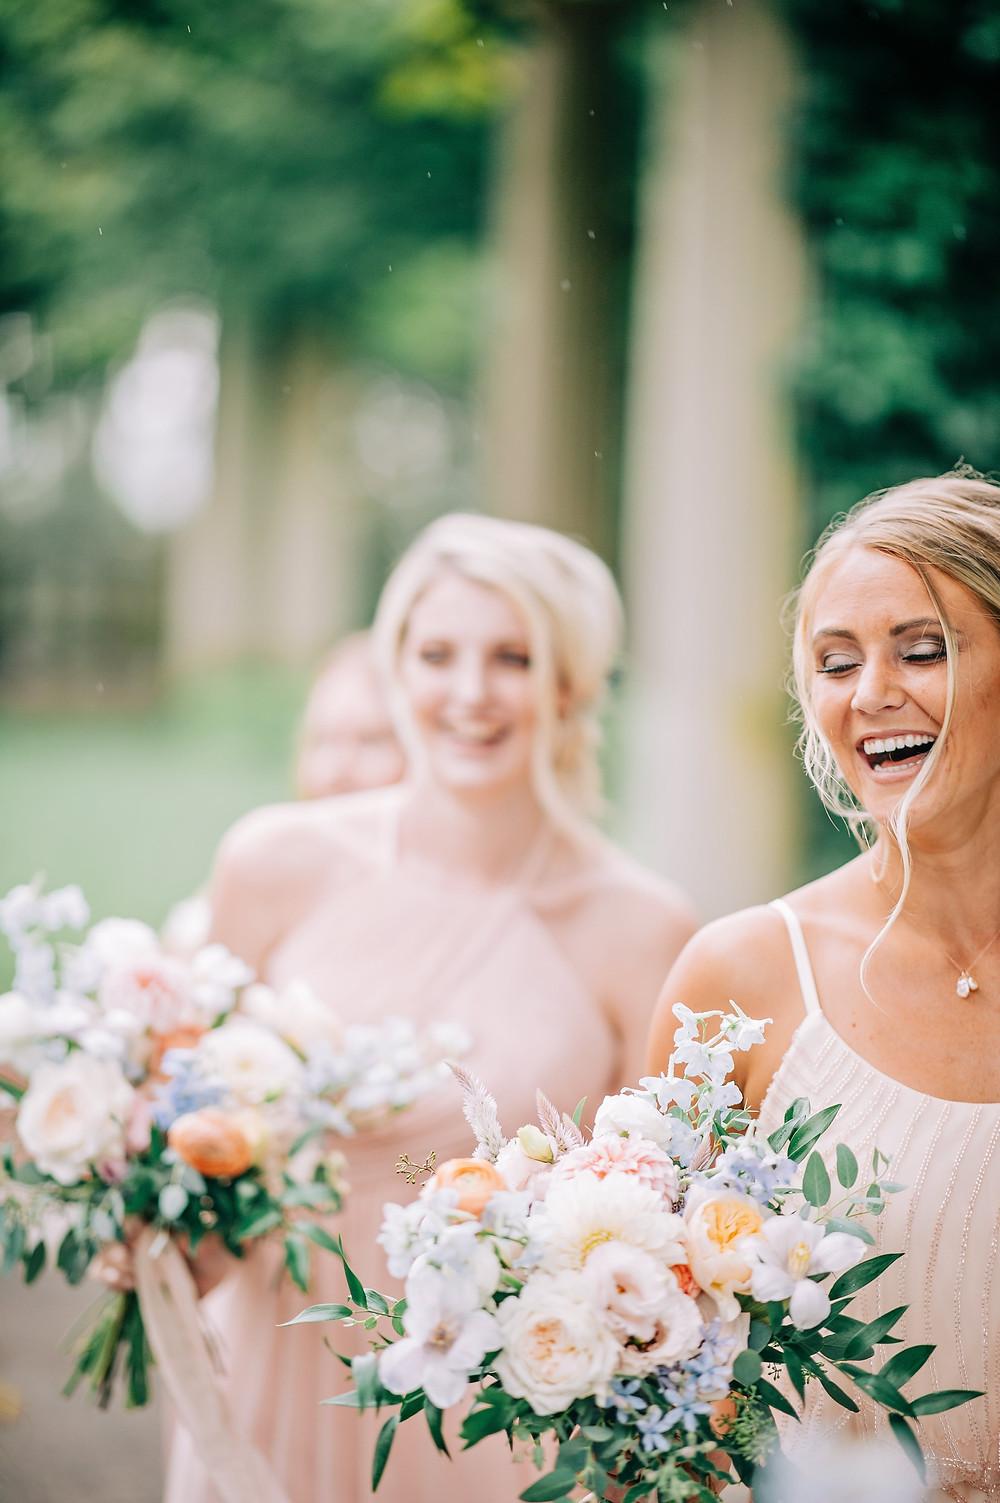 Blush & light blue pastel summer wedding at Eolia Mansion